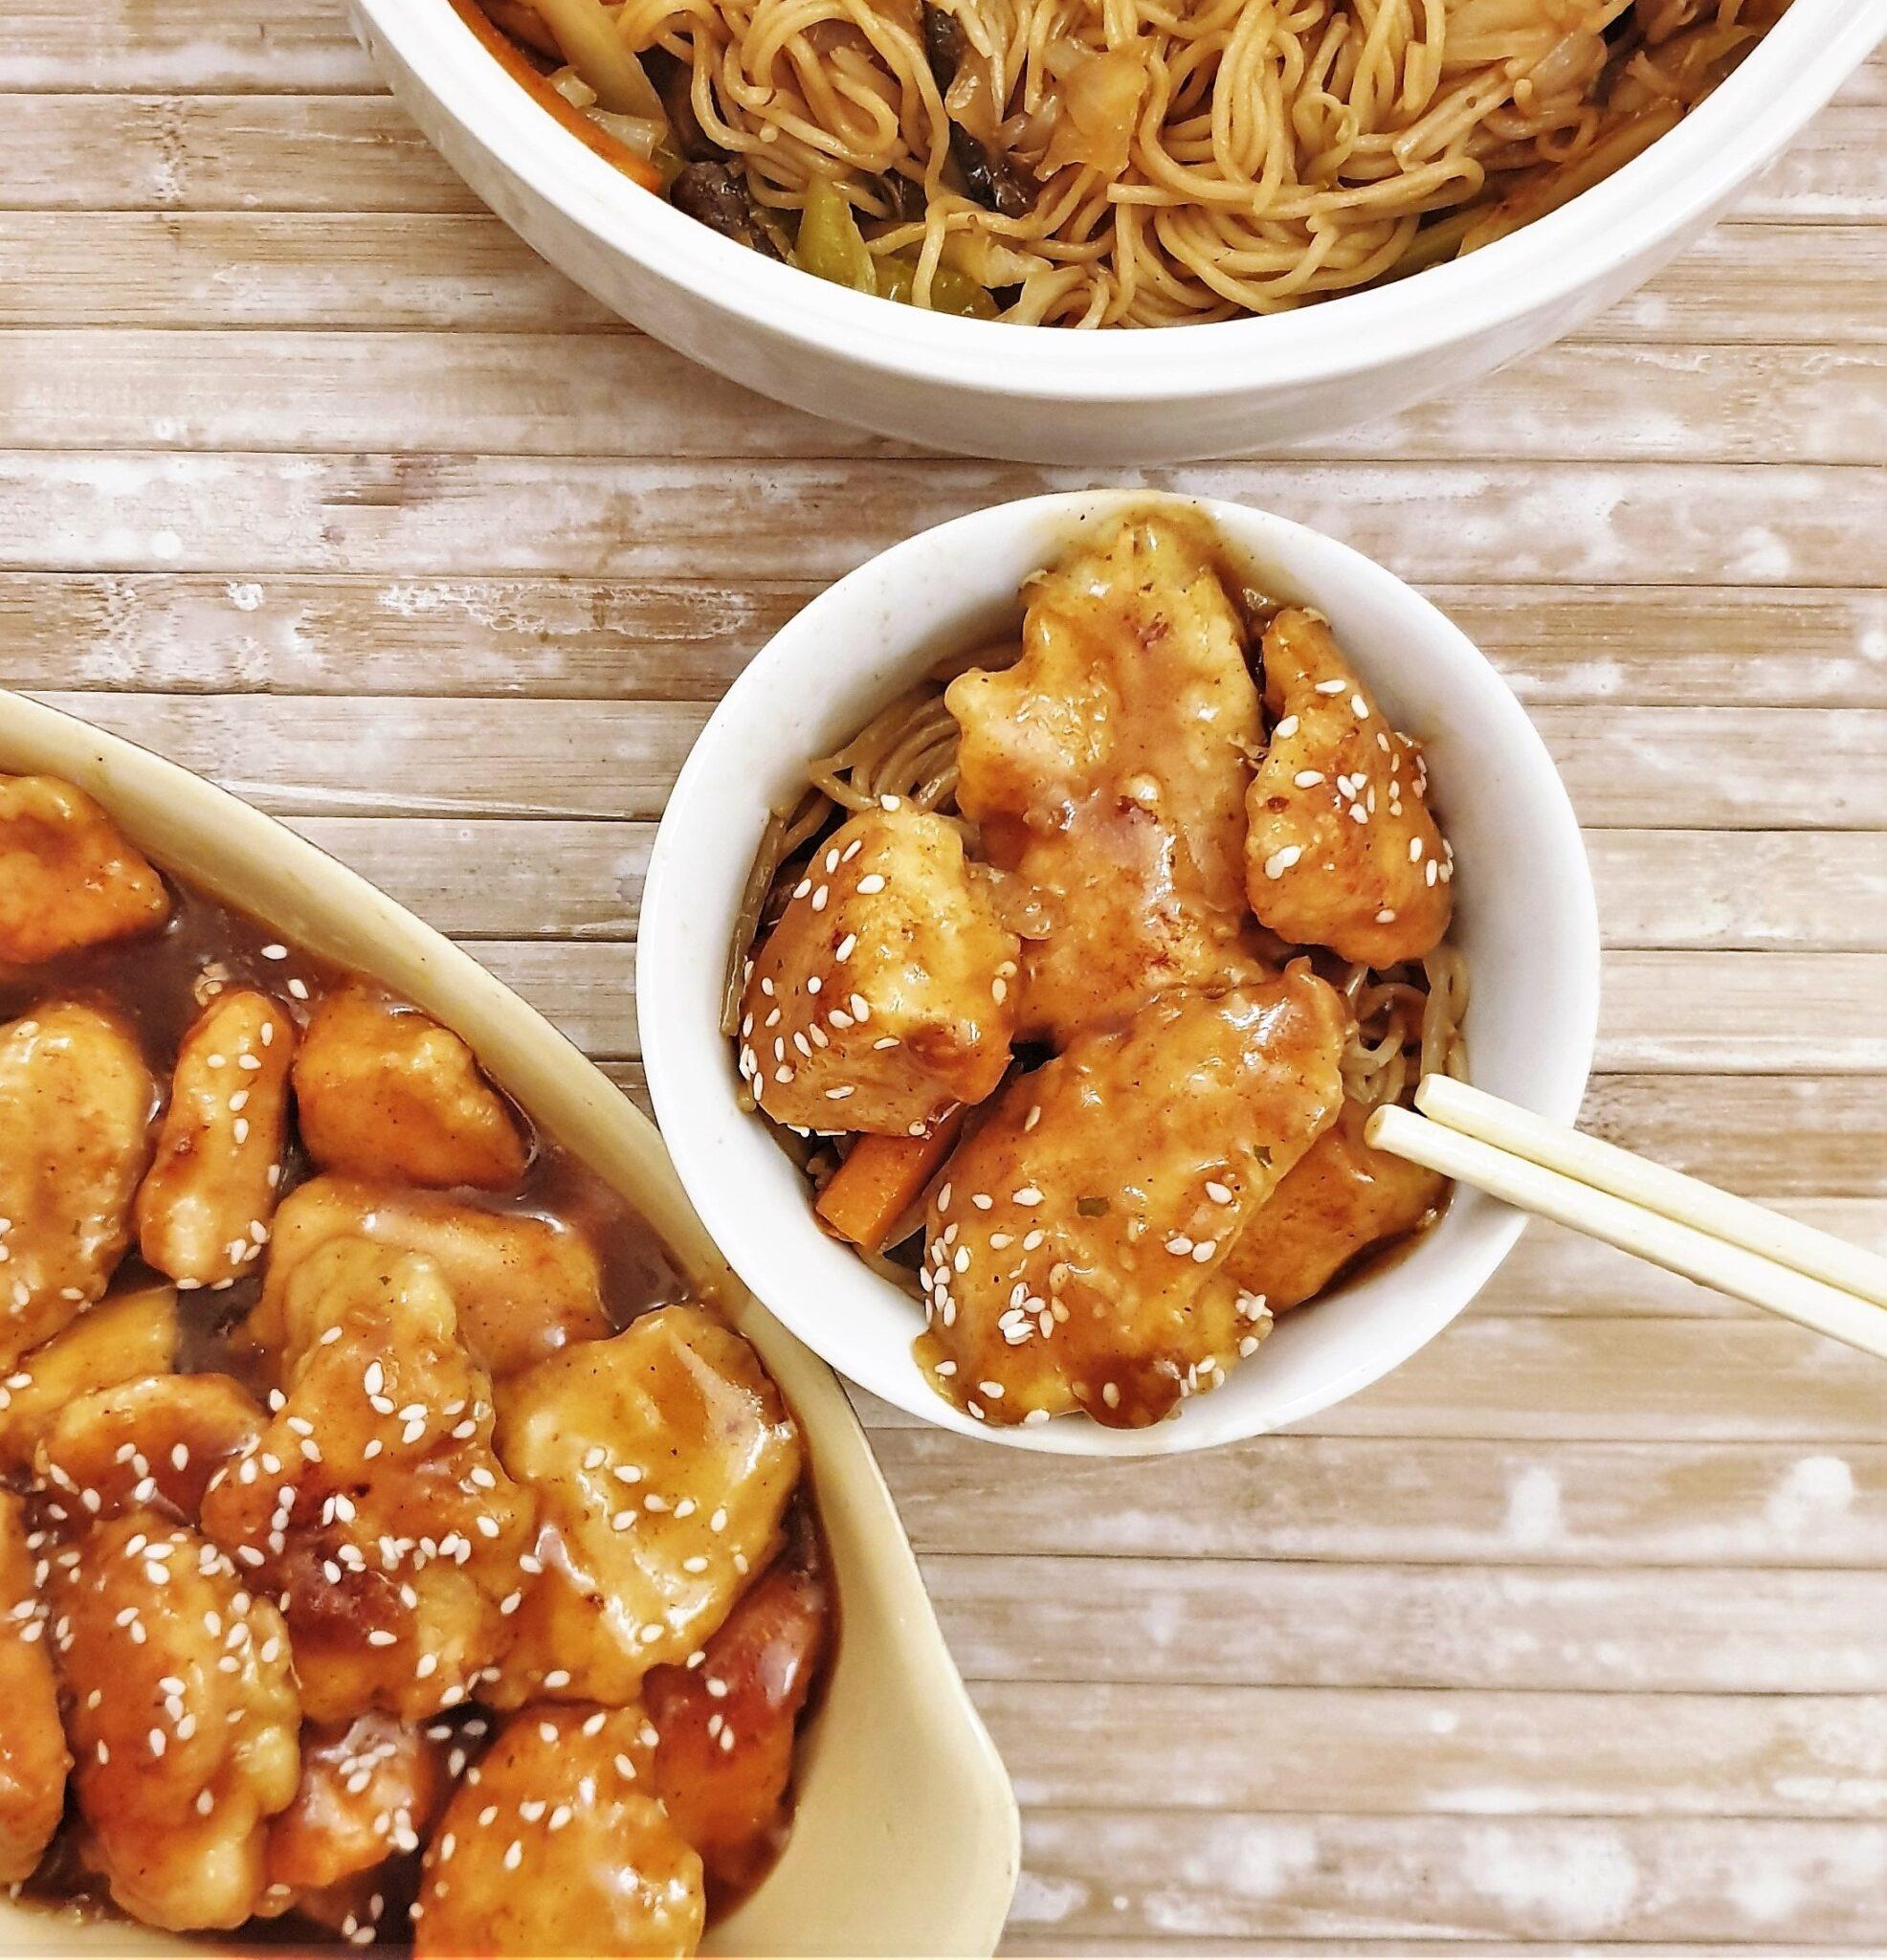 A dish of sesame chicken with chopsticks.